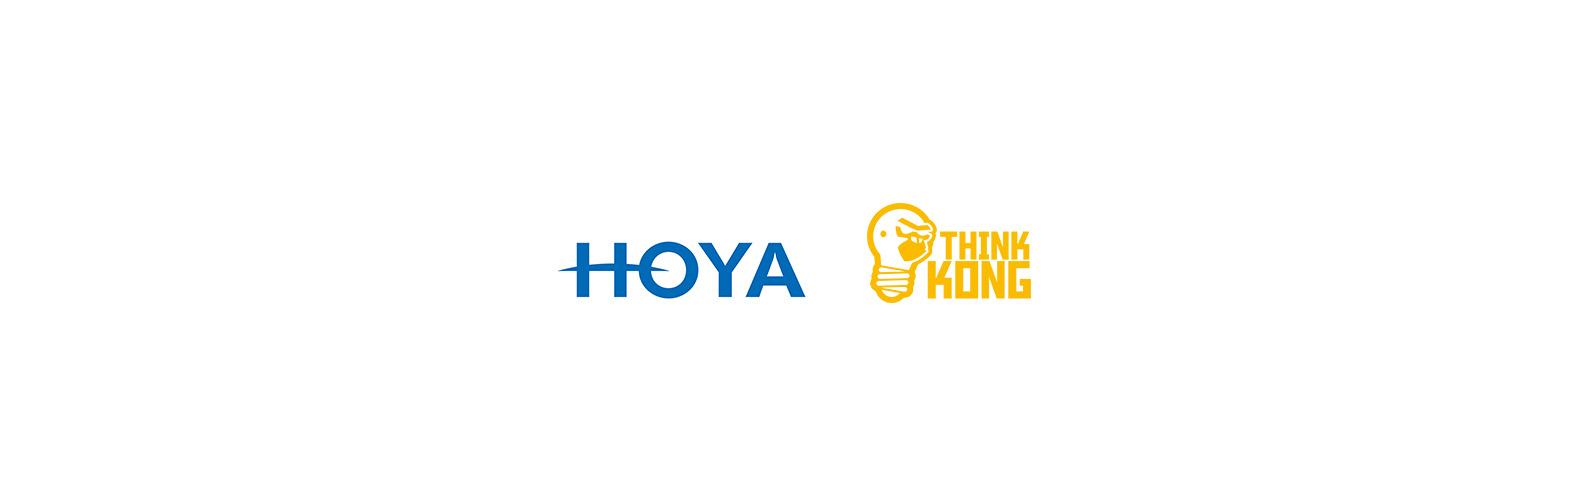 Hoya Lens Poland wybiera agencję social media Think Kong